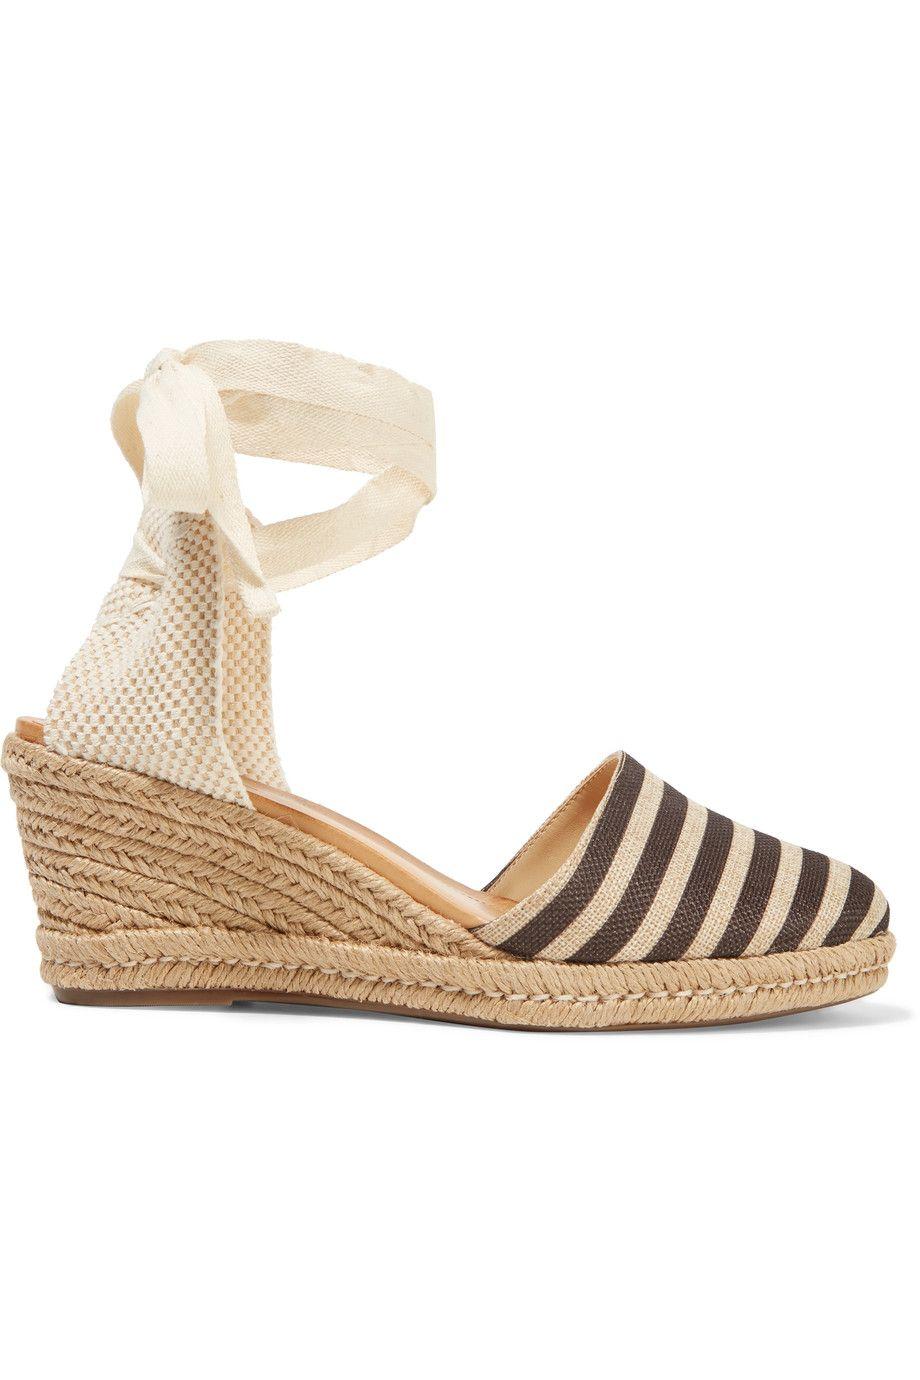 ce2d6873737f9f SCHUTZ Travina Striped Woven Wedge Espadrille Sandals.  schutz  shoes   sandals